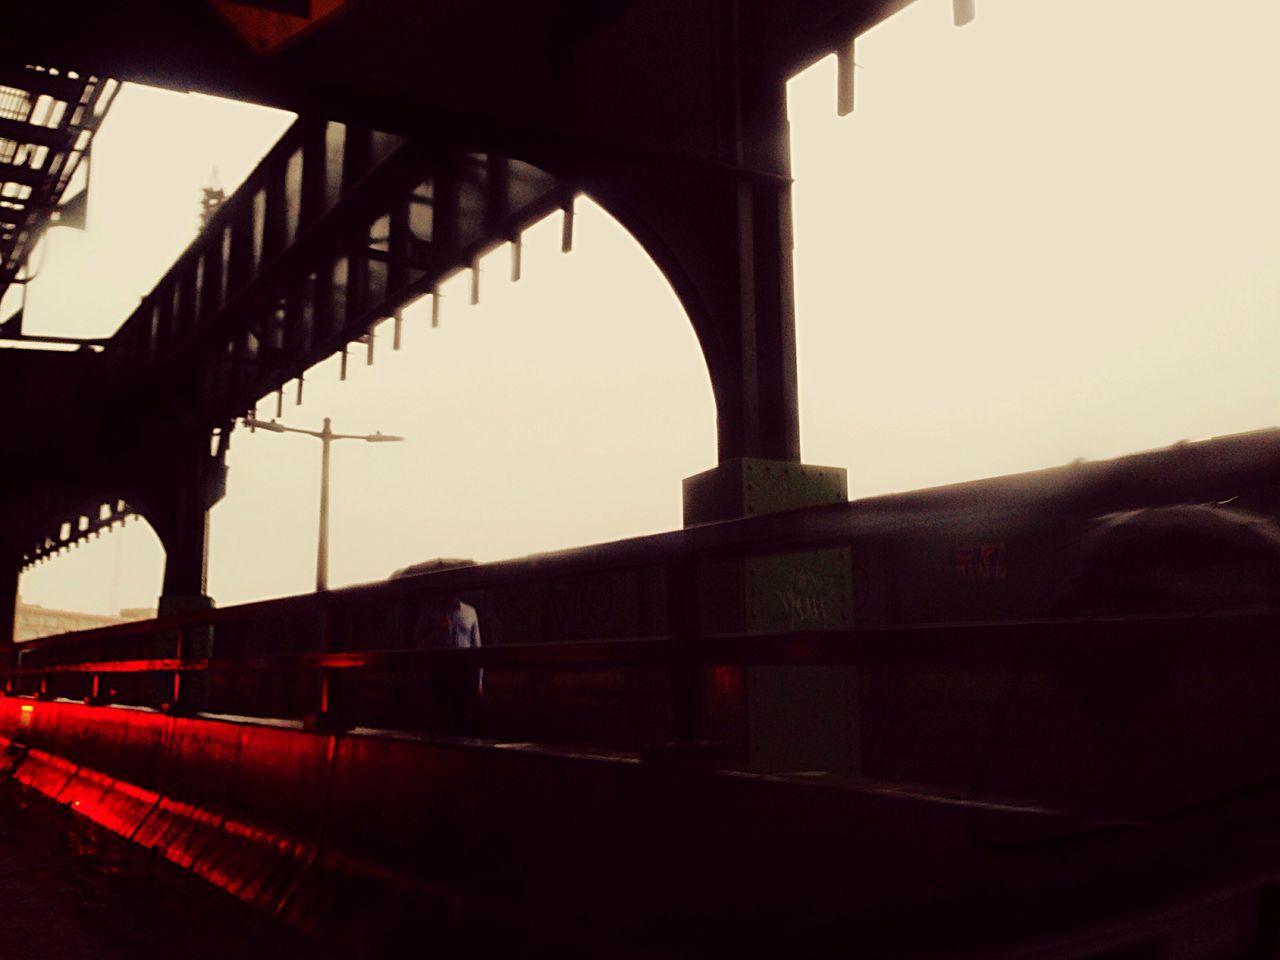 Transportation Bridge - Man Made Structure Rail Transportation City Bridge Photography Railway Bridge